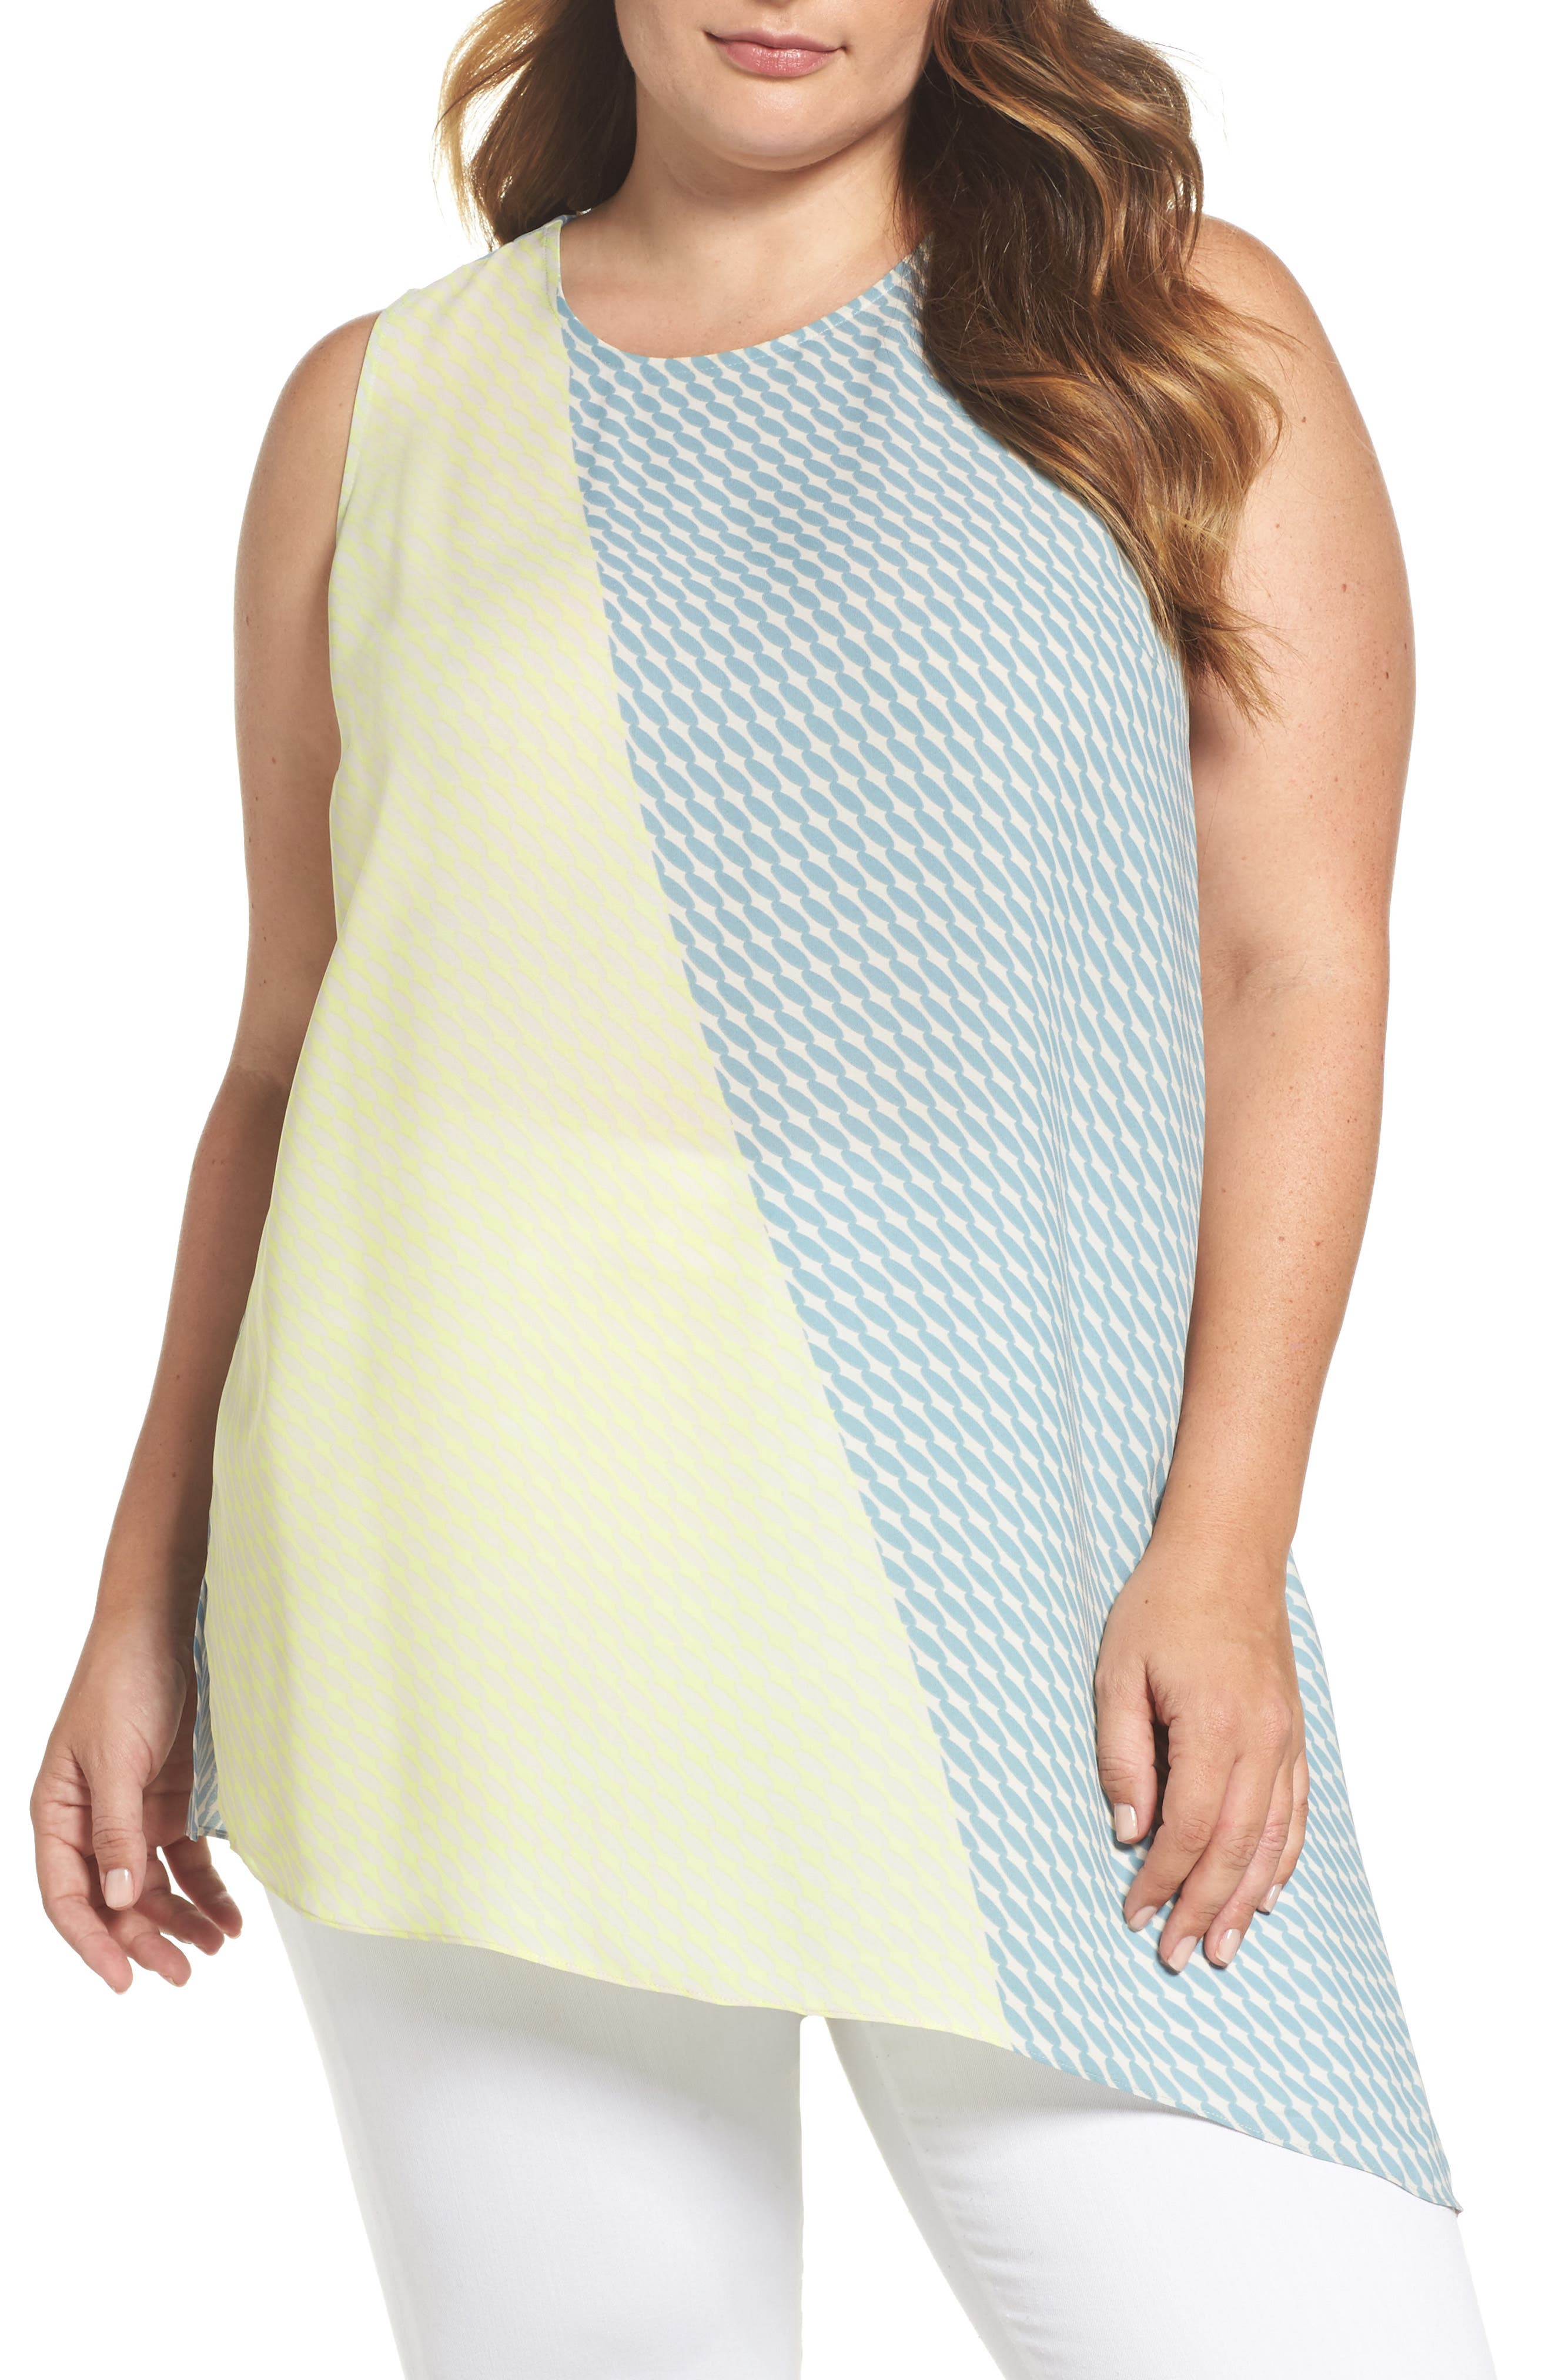 Vince Camuto Modern Slant Colorblock Asymmetrical Top (Plus Size)